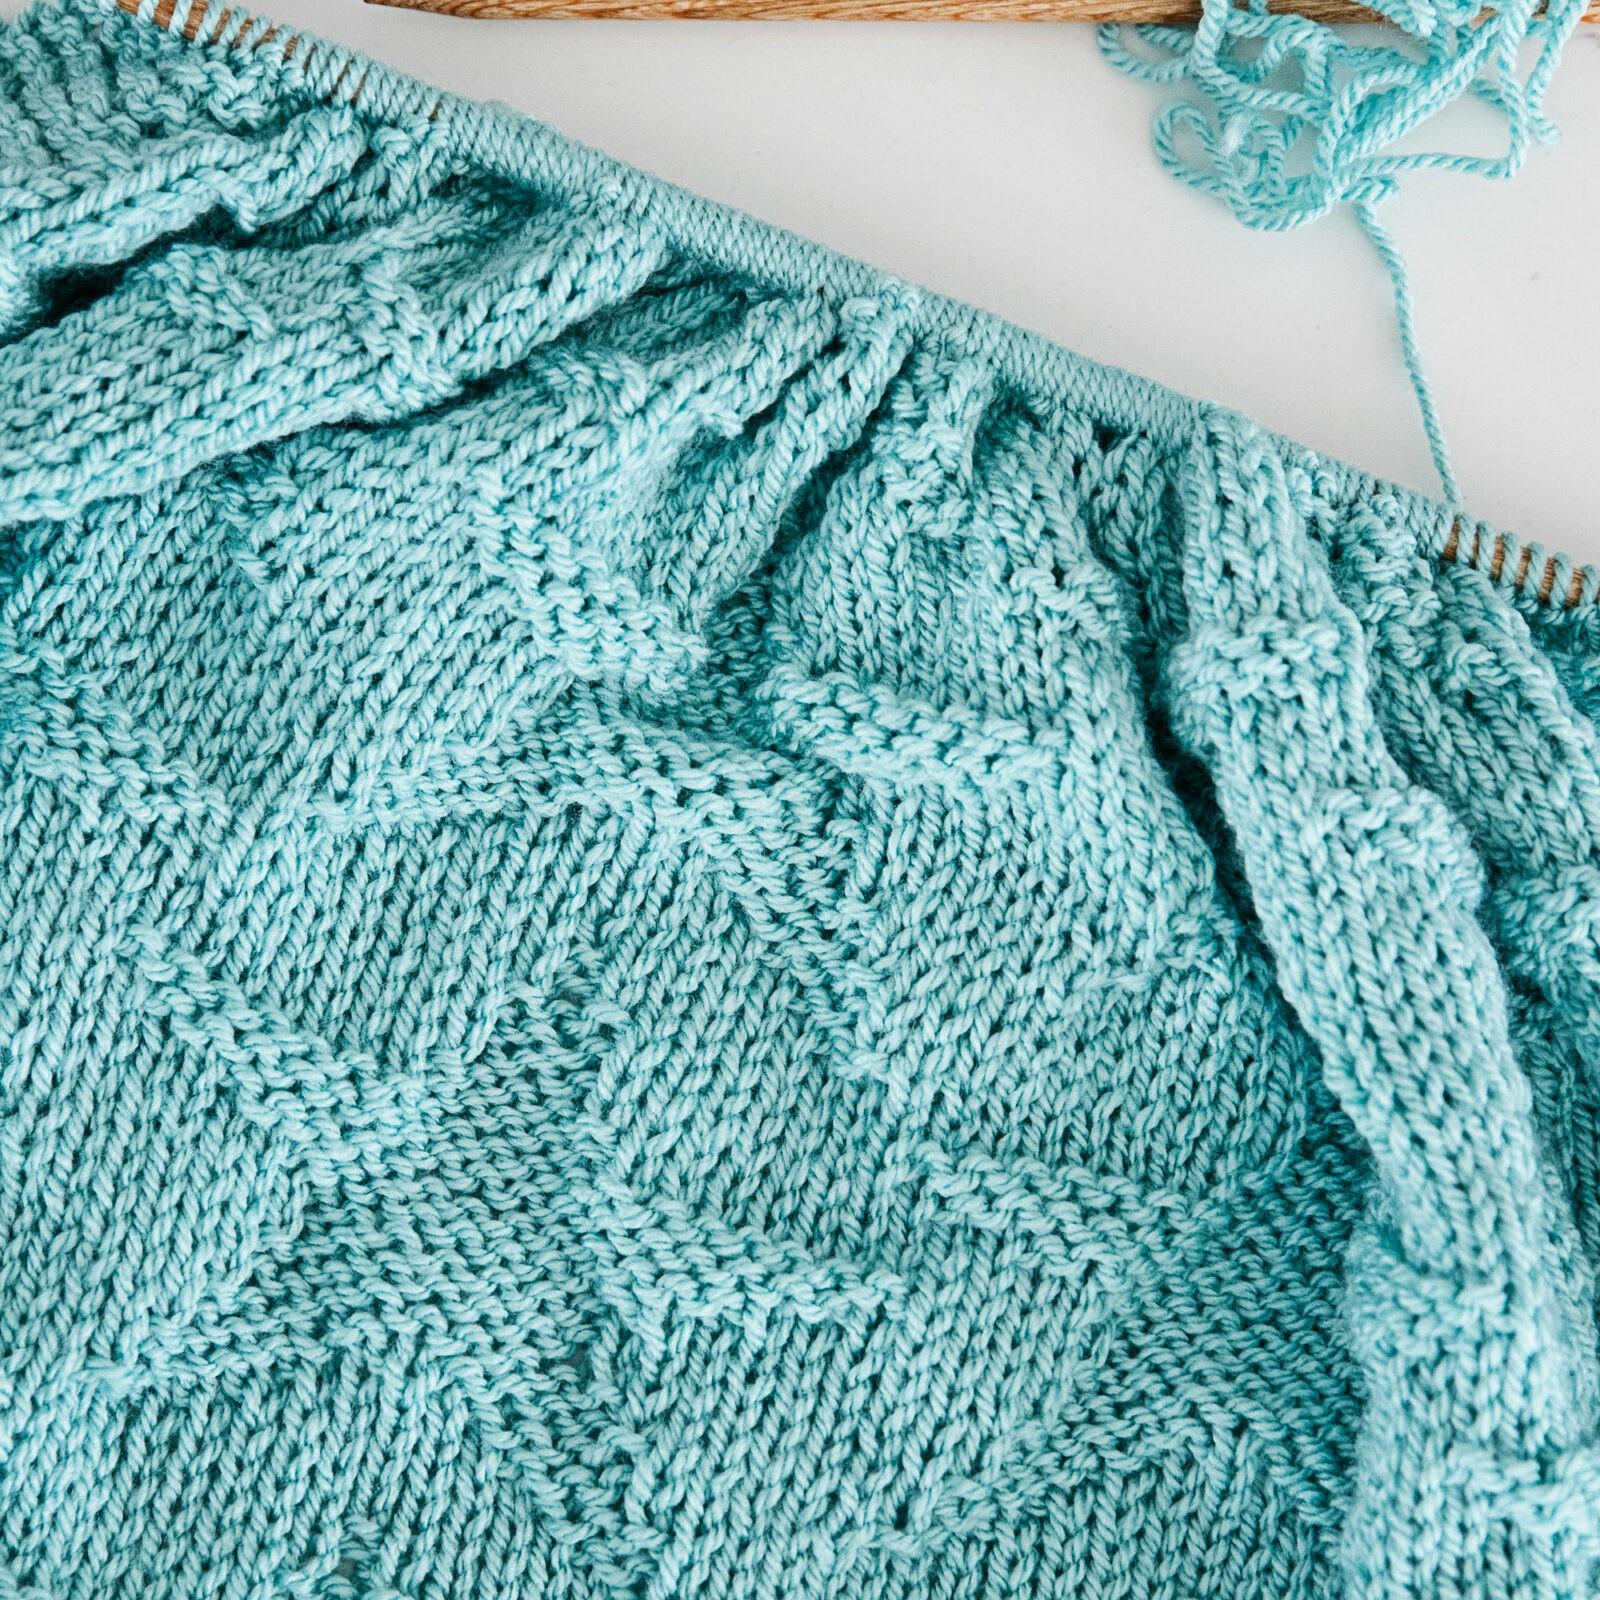 Starry Night Baby Blanket Knitting Pattern Leelee Knits